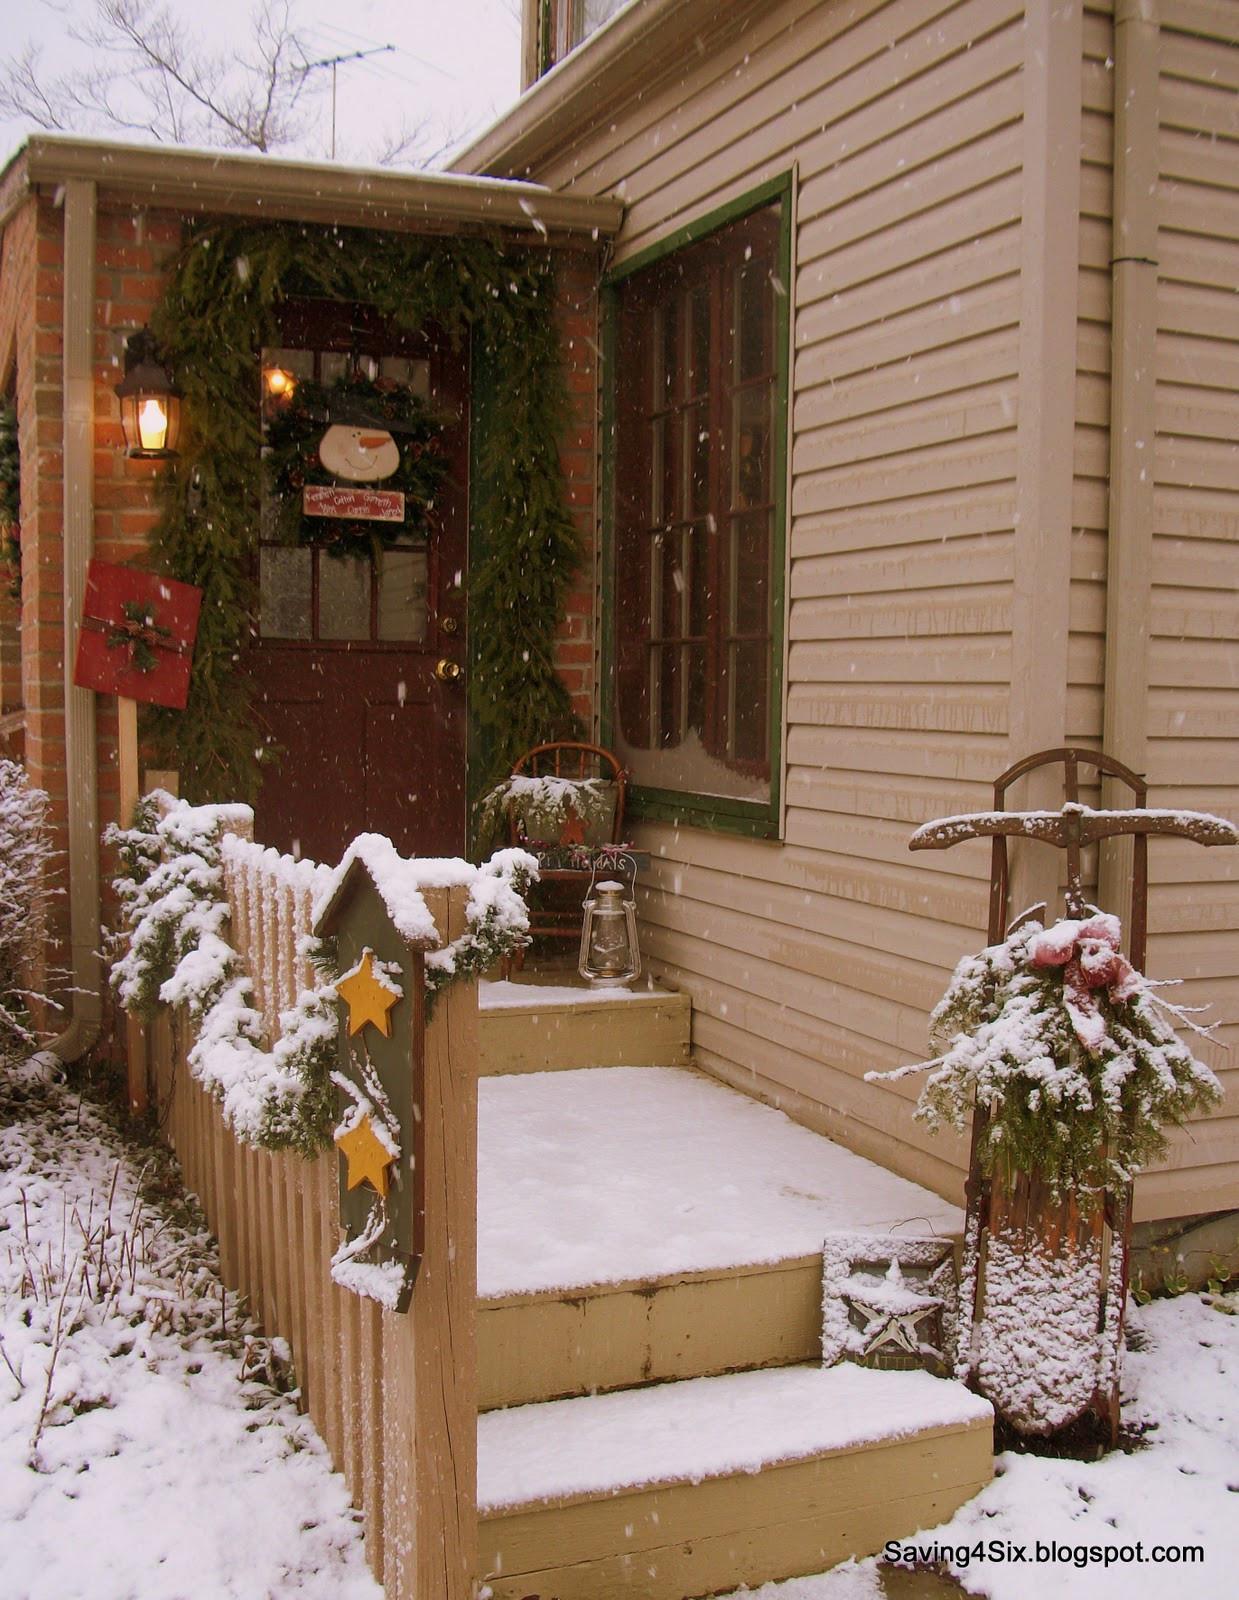 Porch Decor For Christmas  Decorating My Porch for Christmas